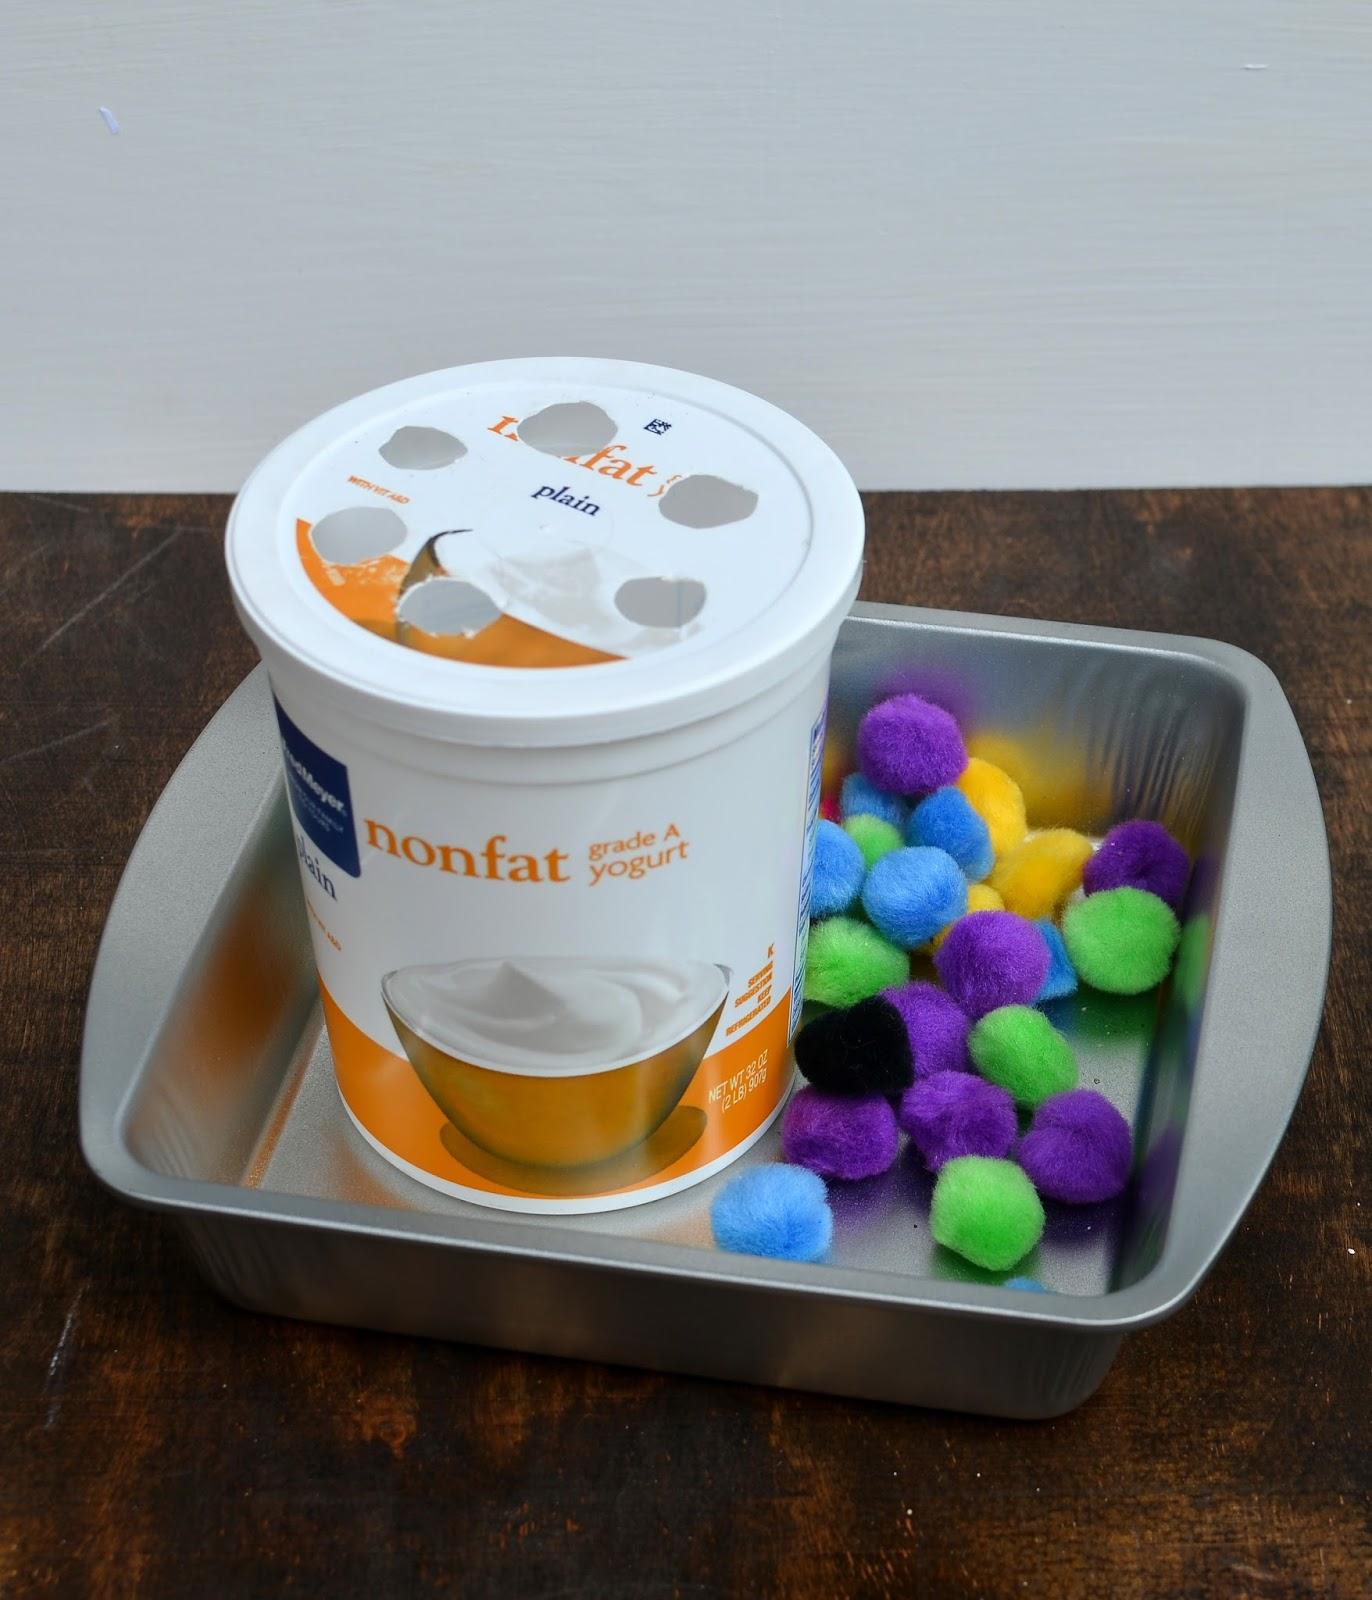 toddler sensory activities, yogurt container and fluff balls